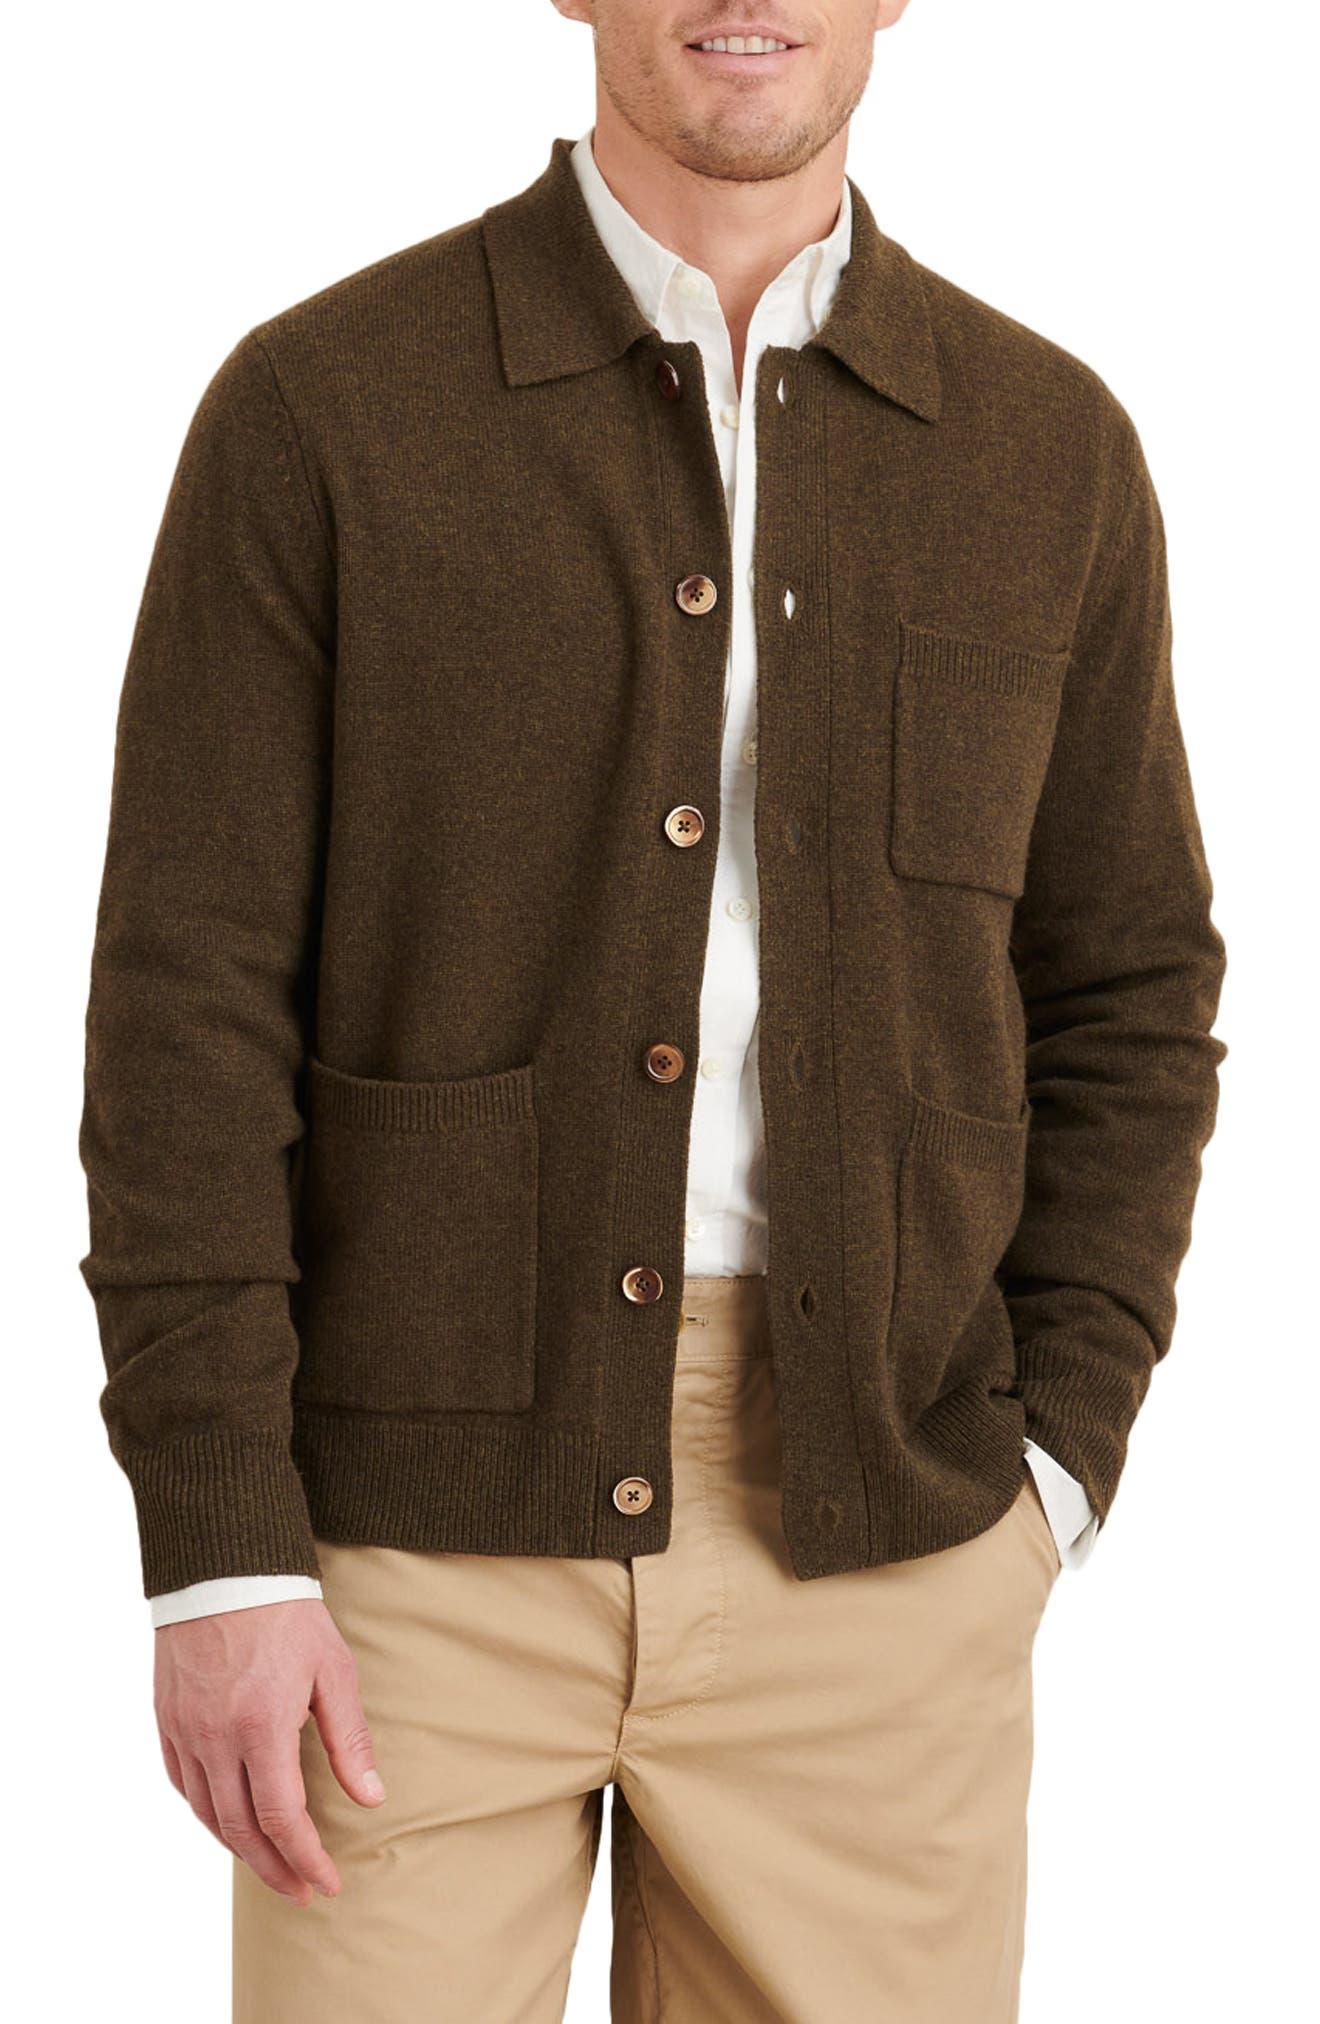 1920s Men's Style Clothing Alex Mill Merino Wool Cardigan Size Medium in Heather Green at Nordstrom $185.00 AT vintagedancer.com